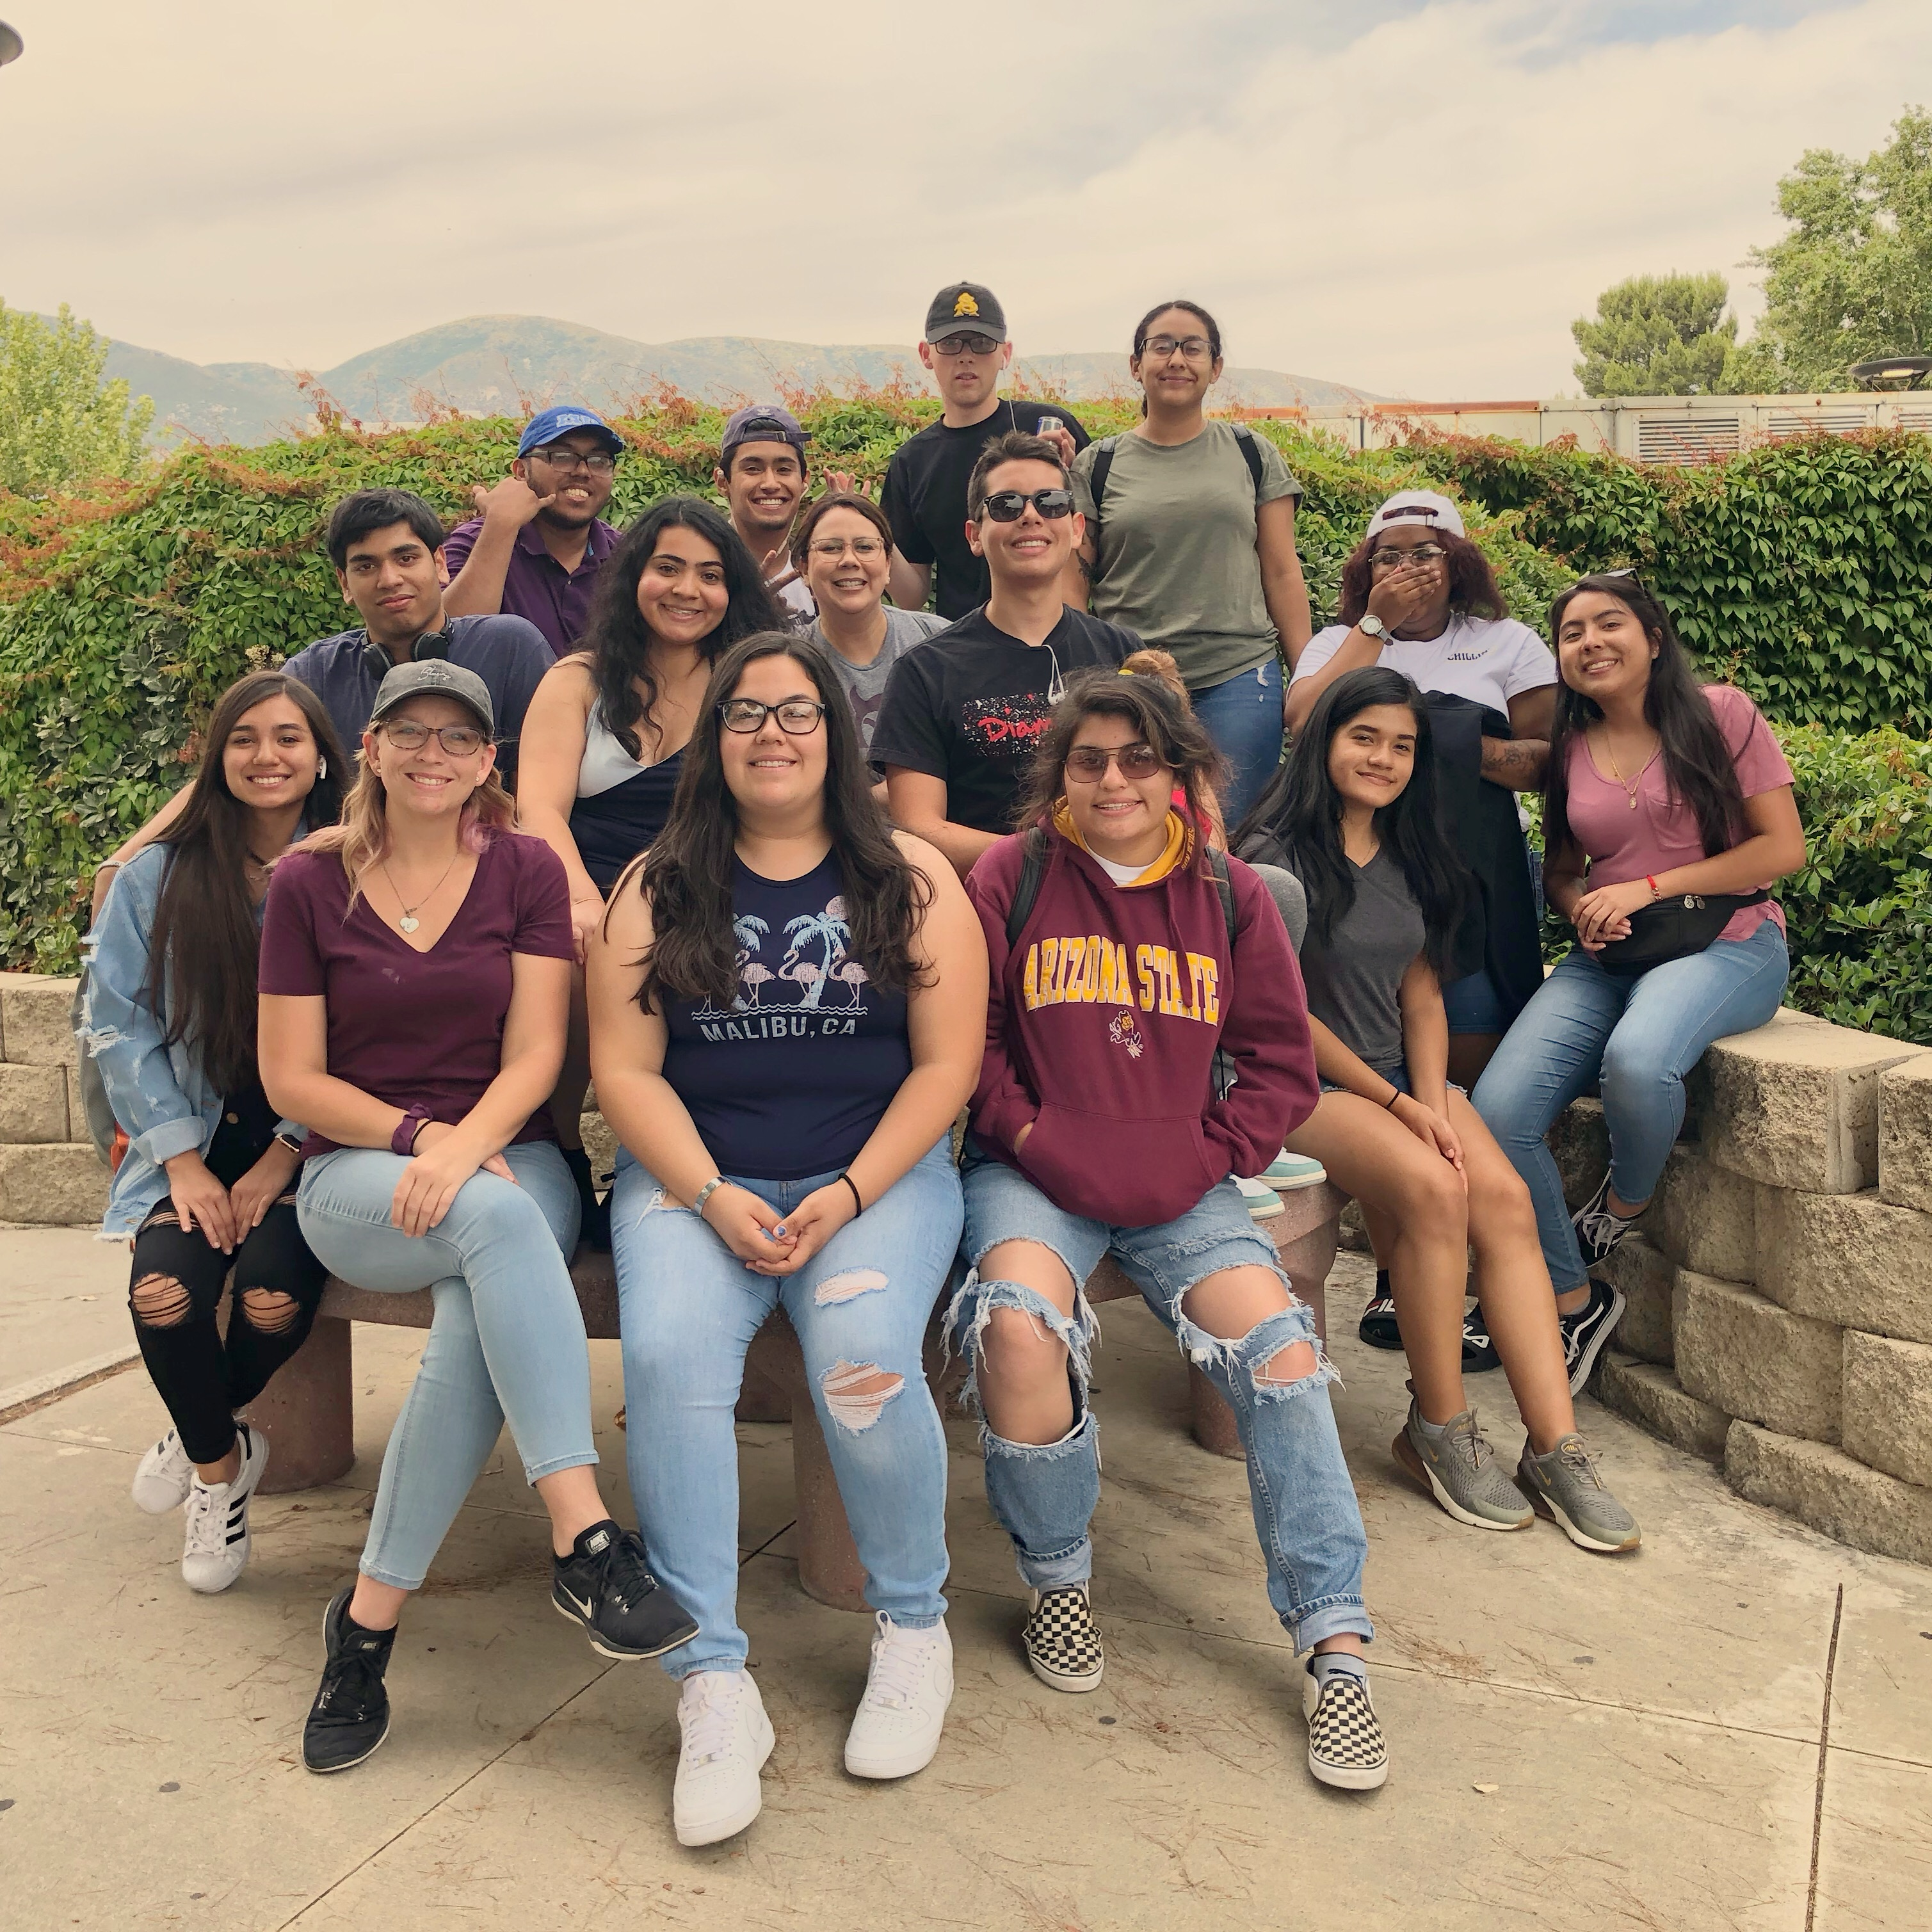 Upward Bound Students on 2019 College Tour